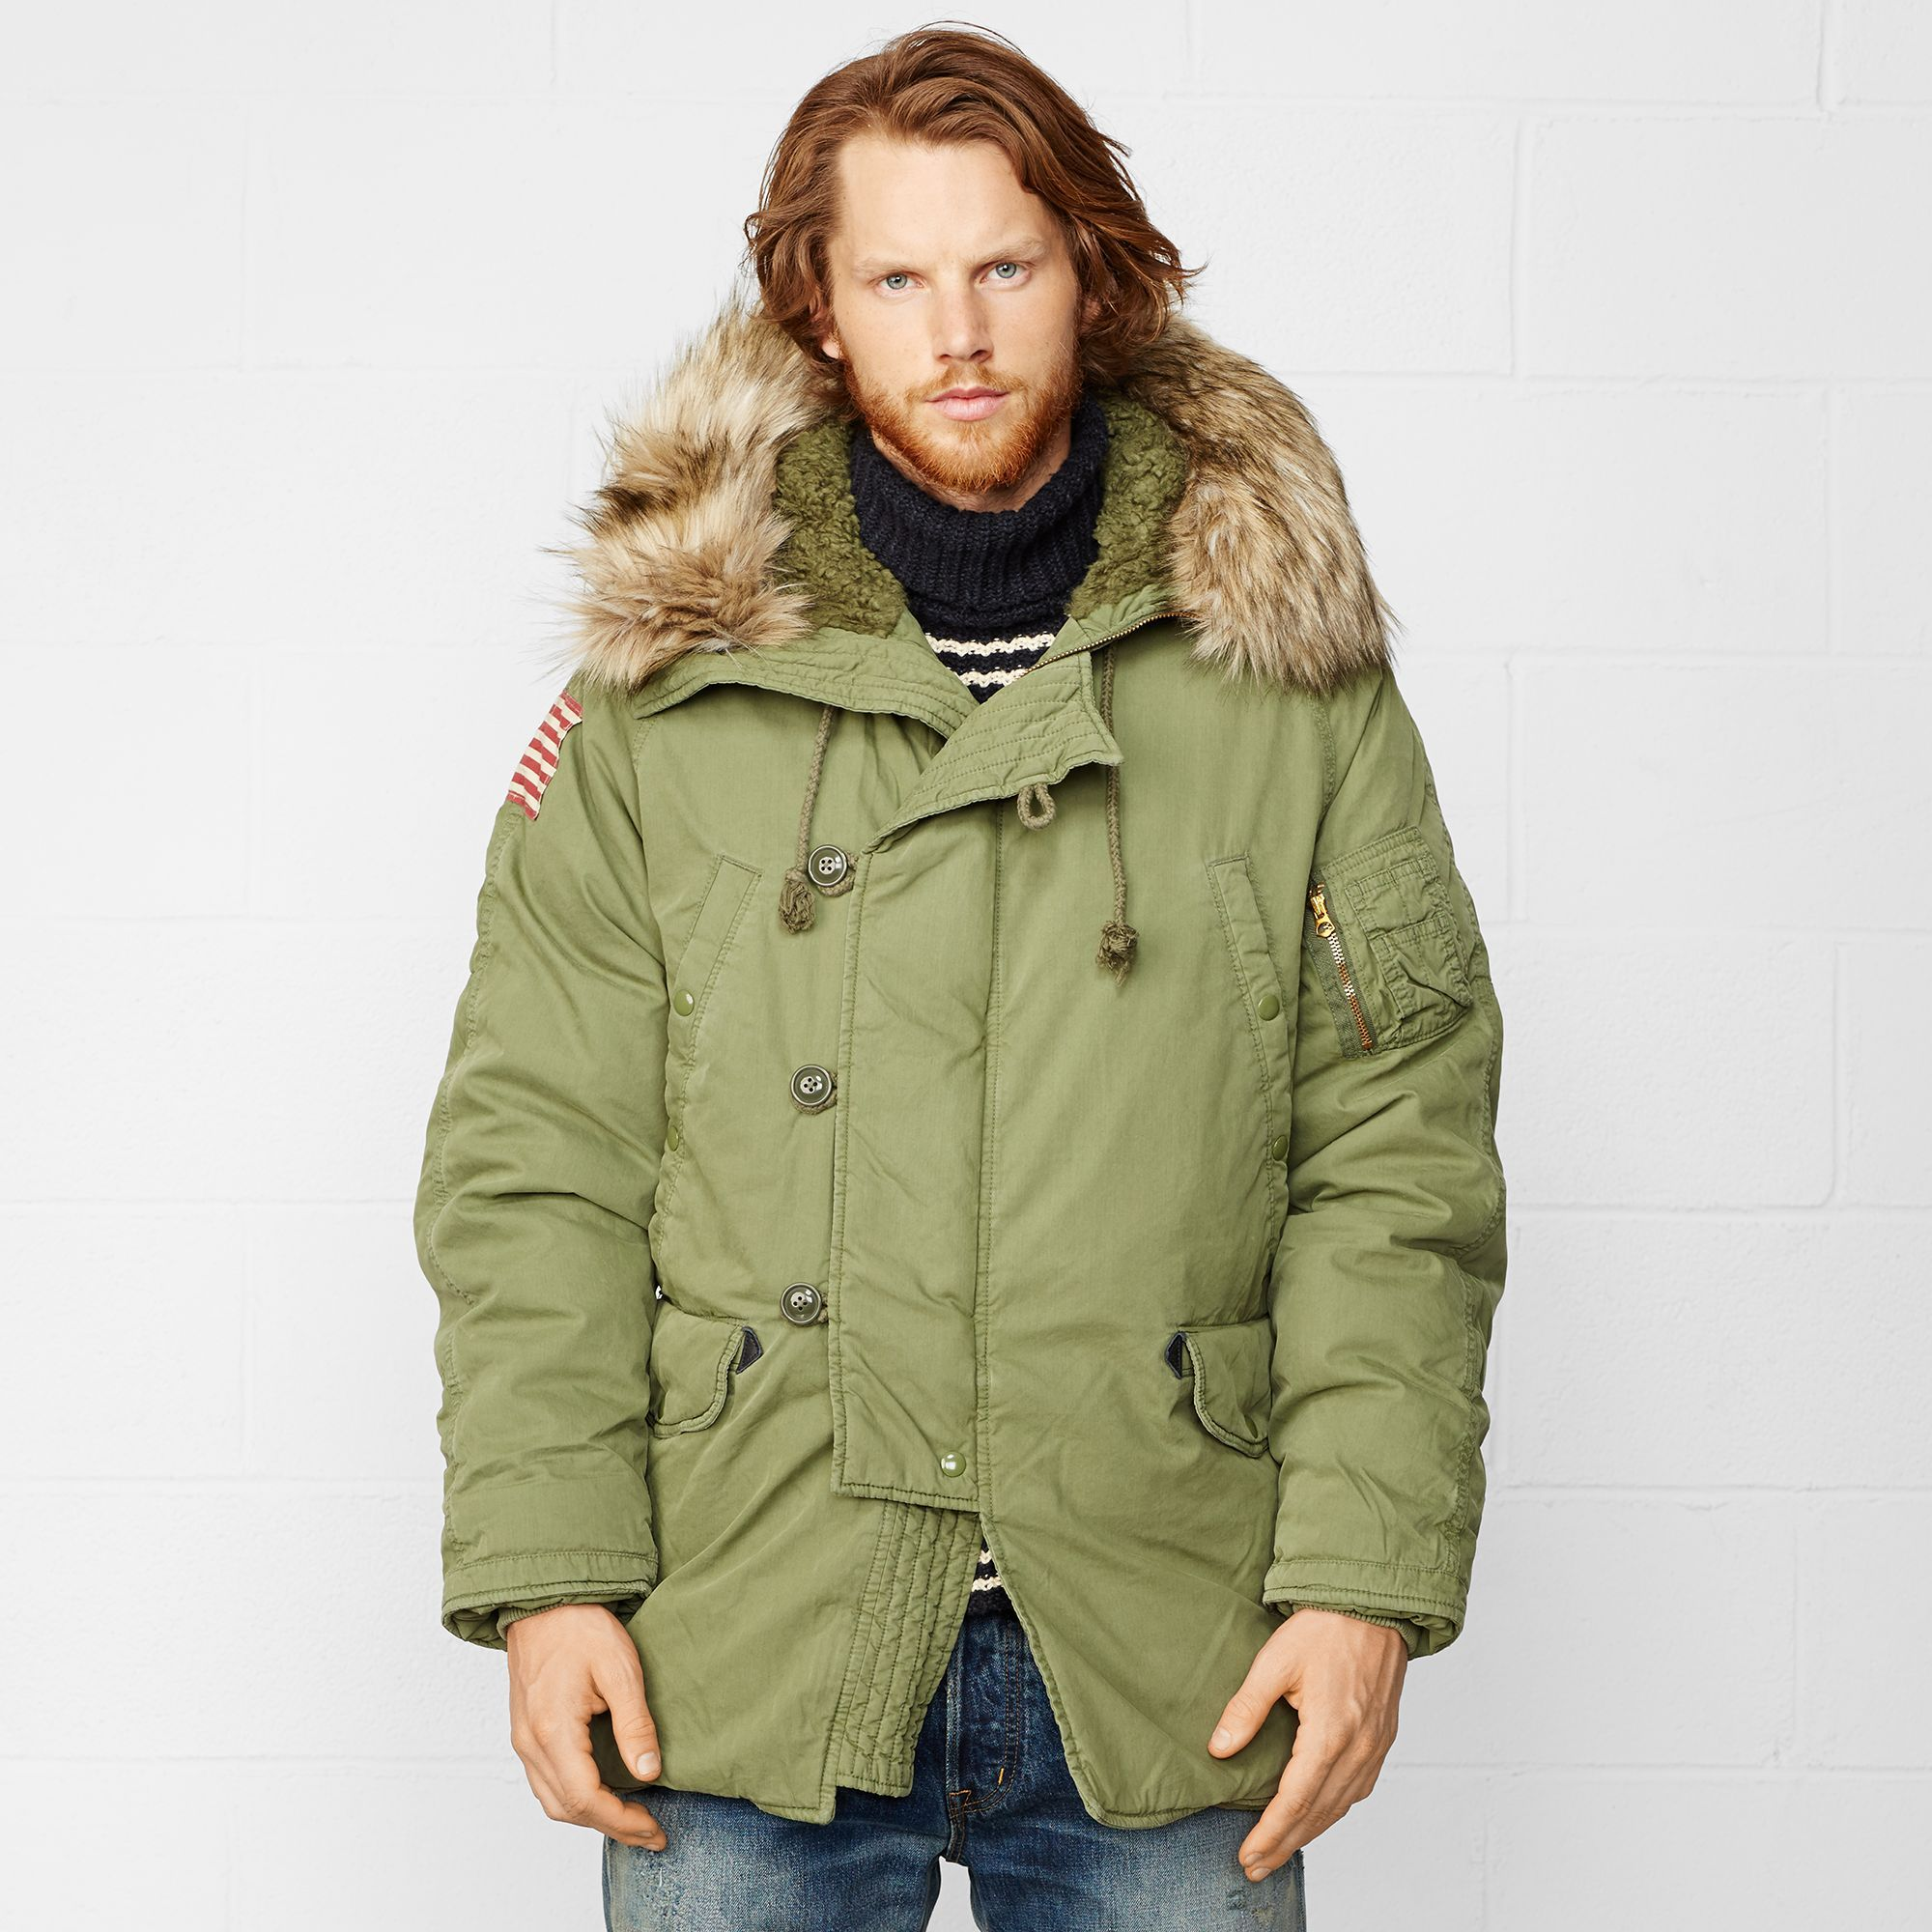 Down Snorkel Jacket Denim And Supply Jackets Outerwear Jackets [ 2000 x 2000 Pixel ]